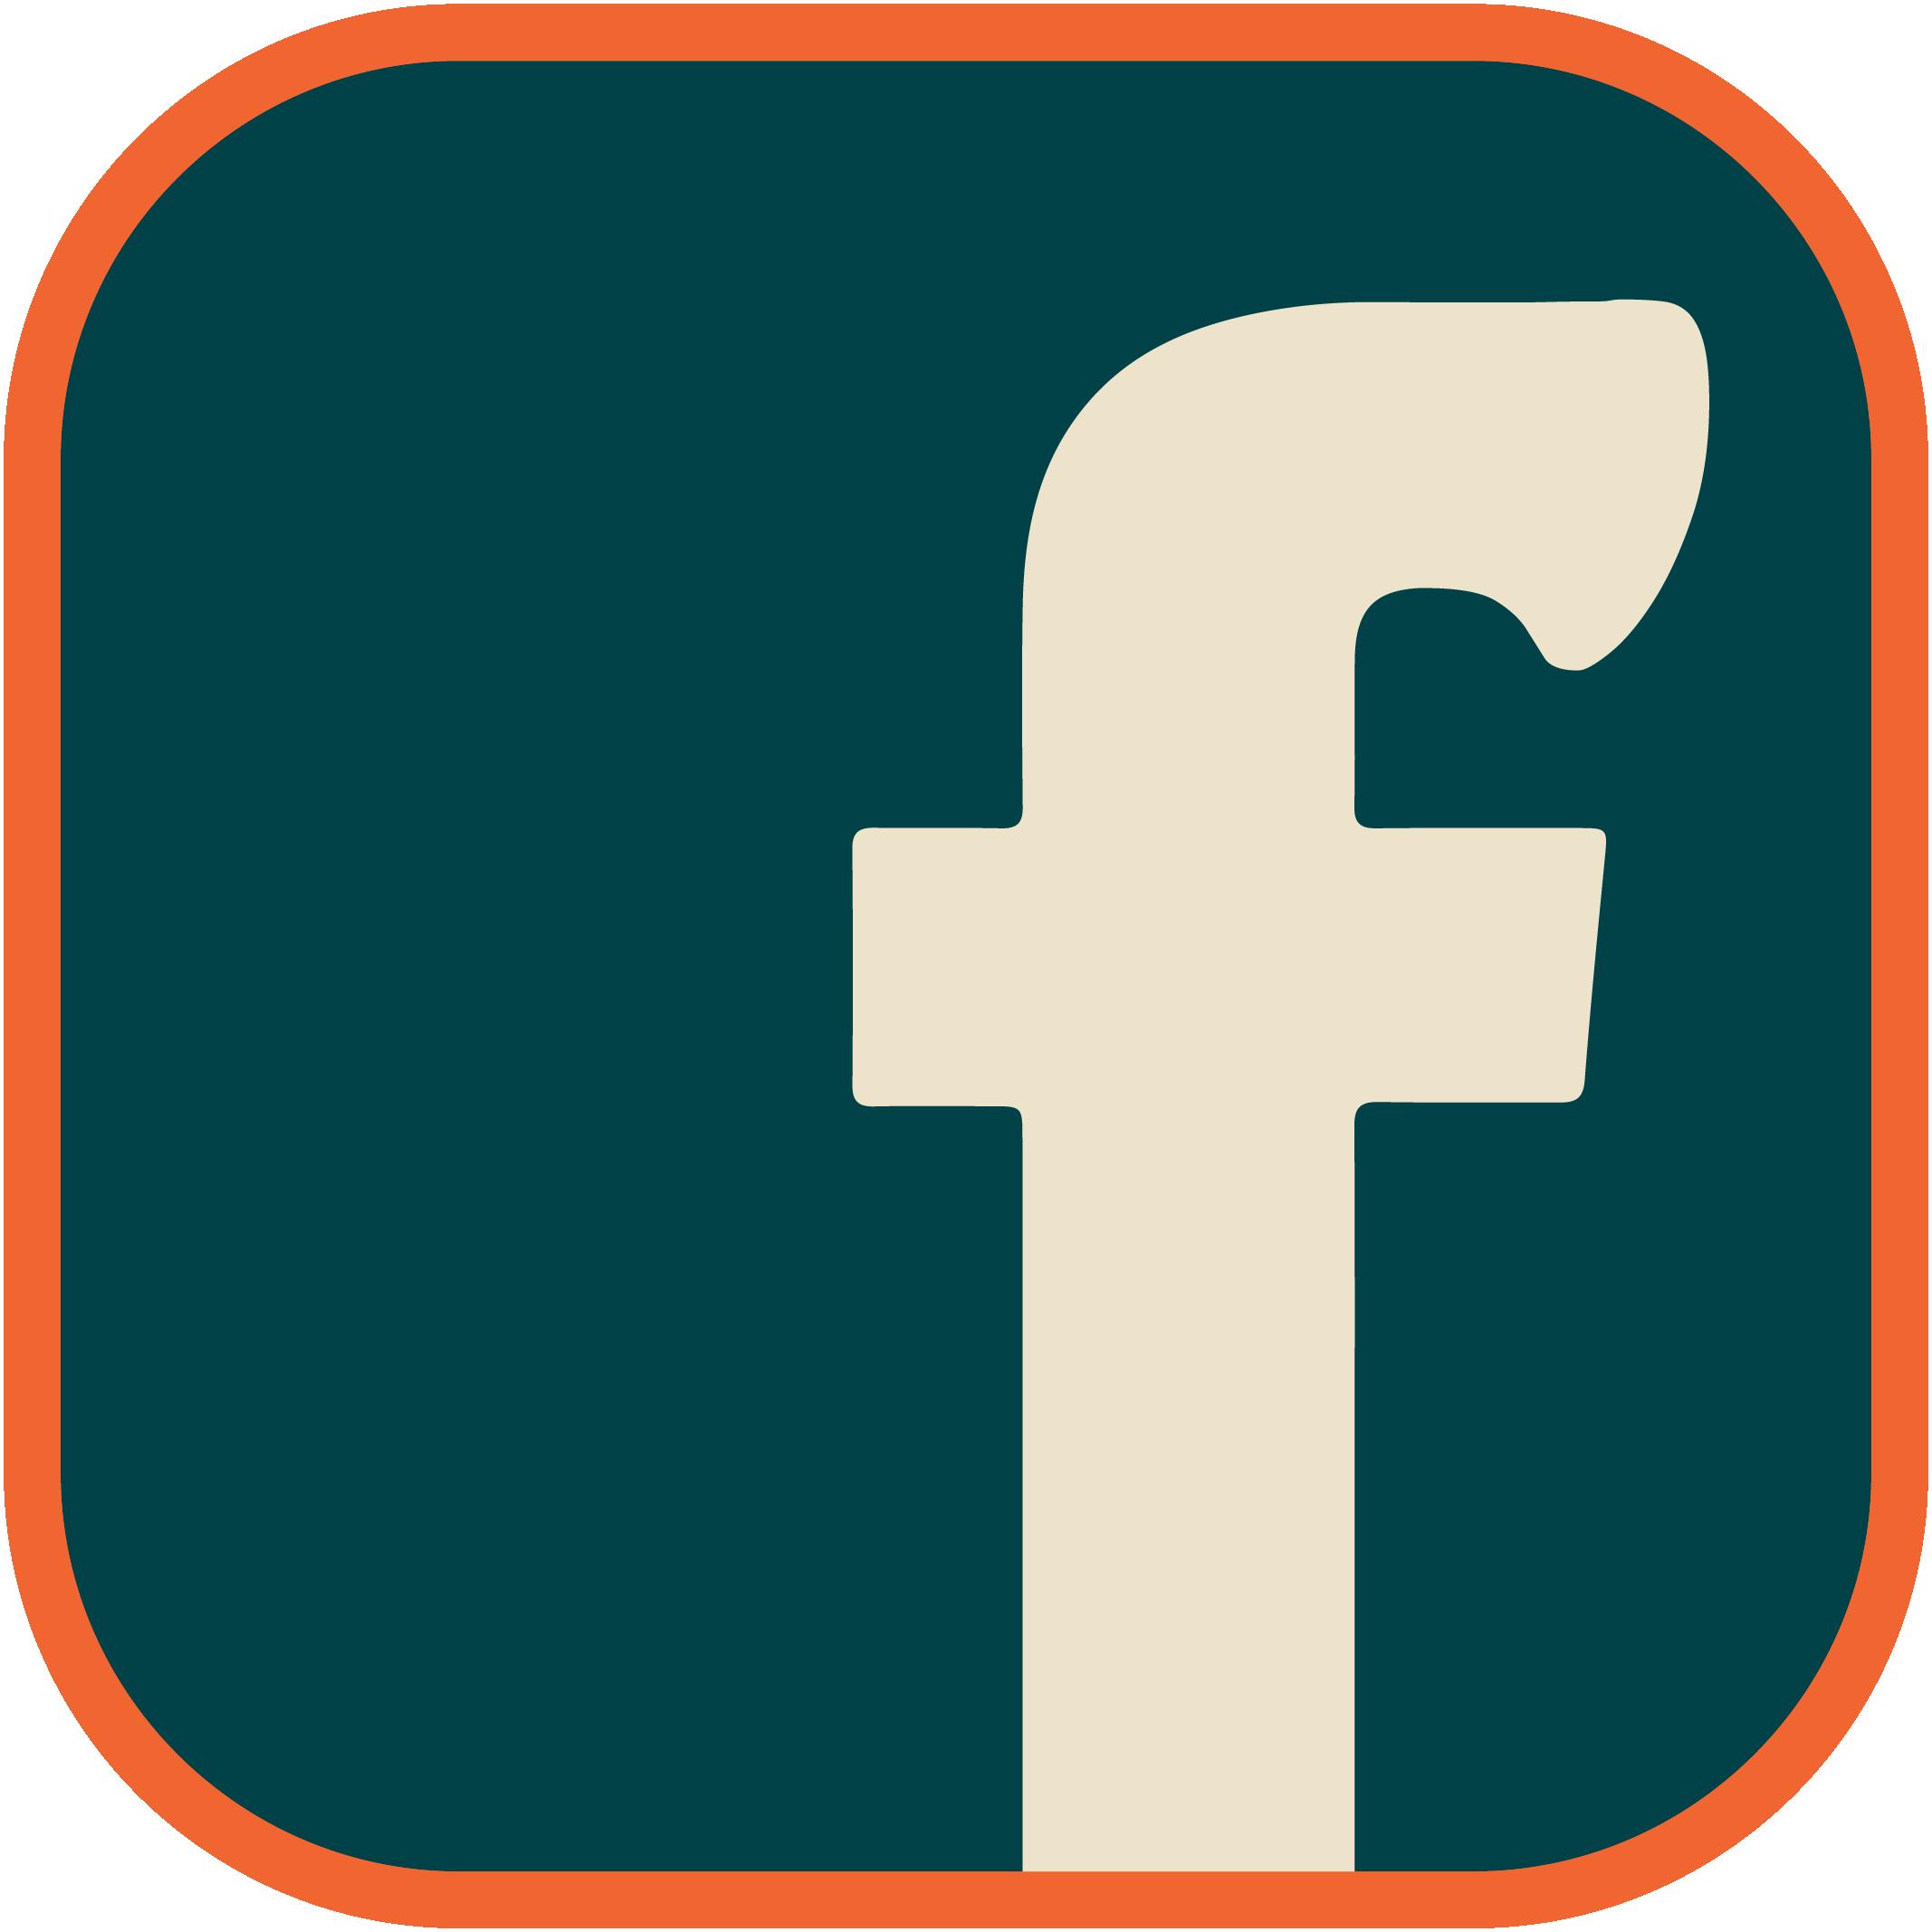 GTD_Rebrand_SocialIcons_facebook.png